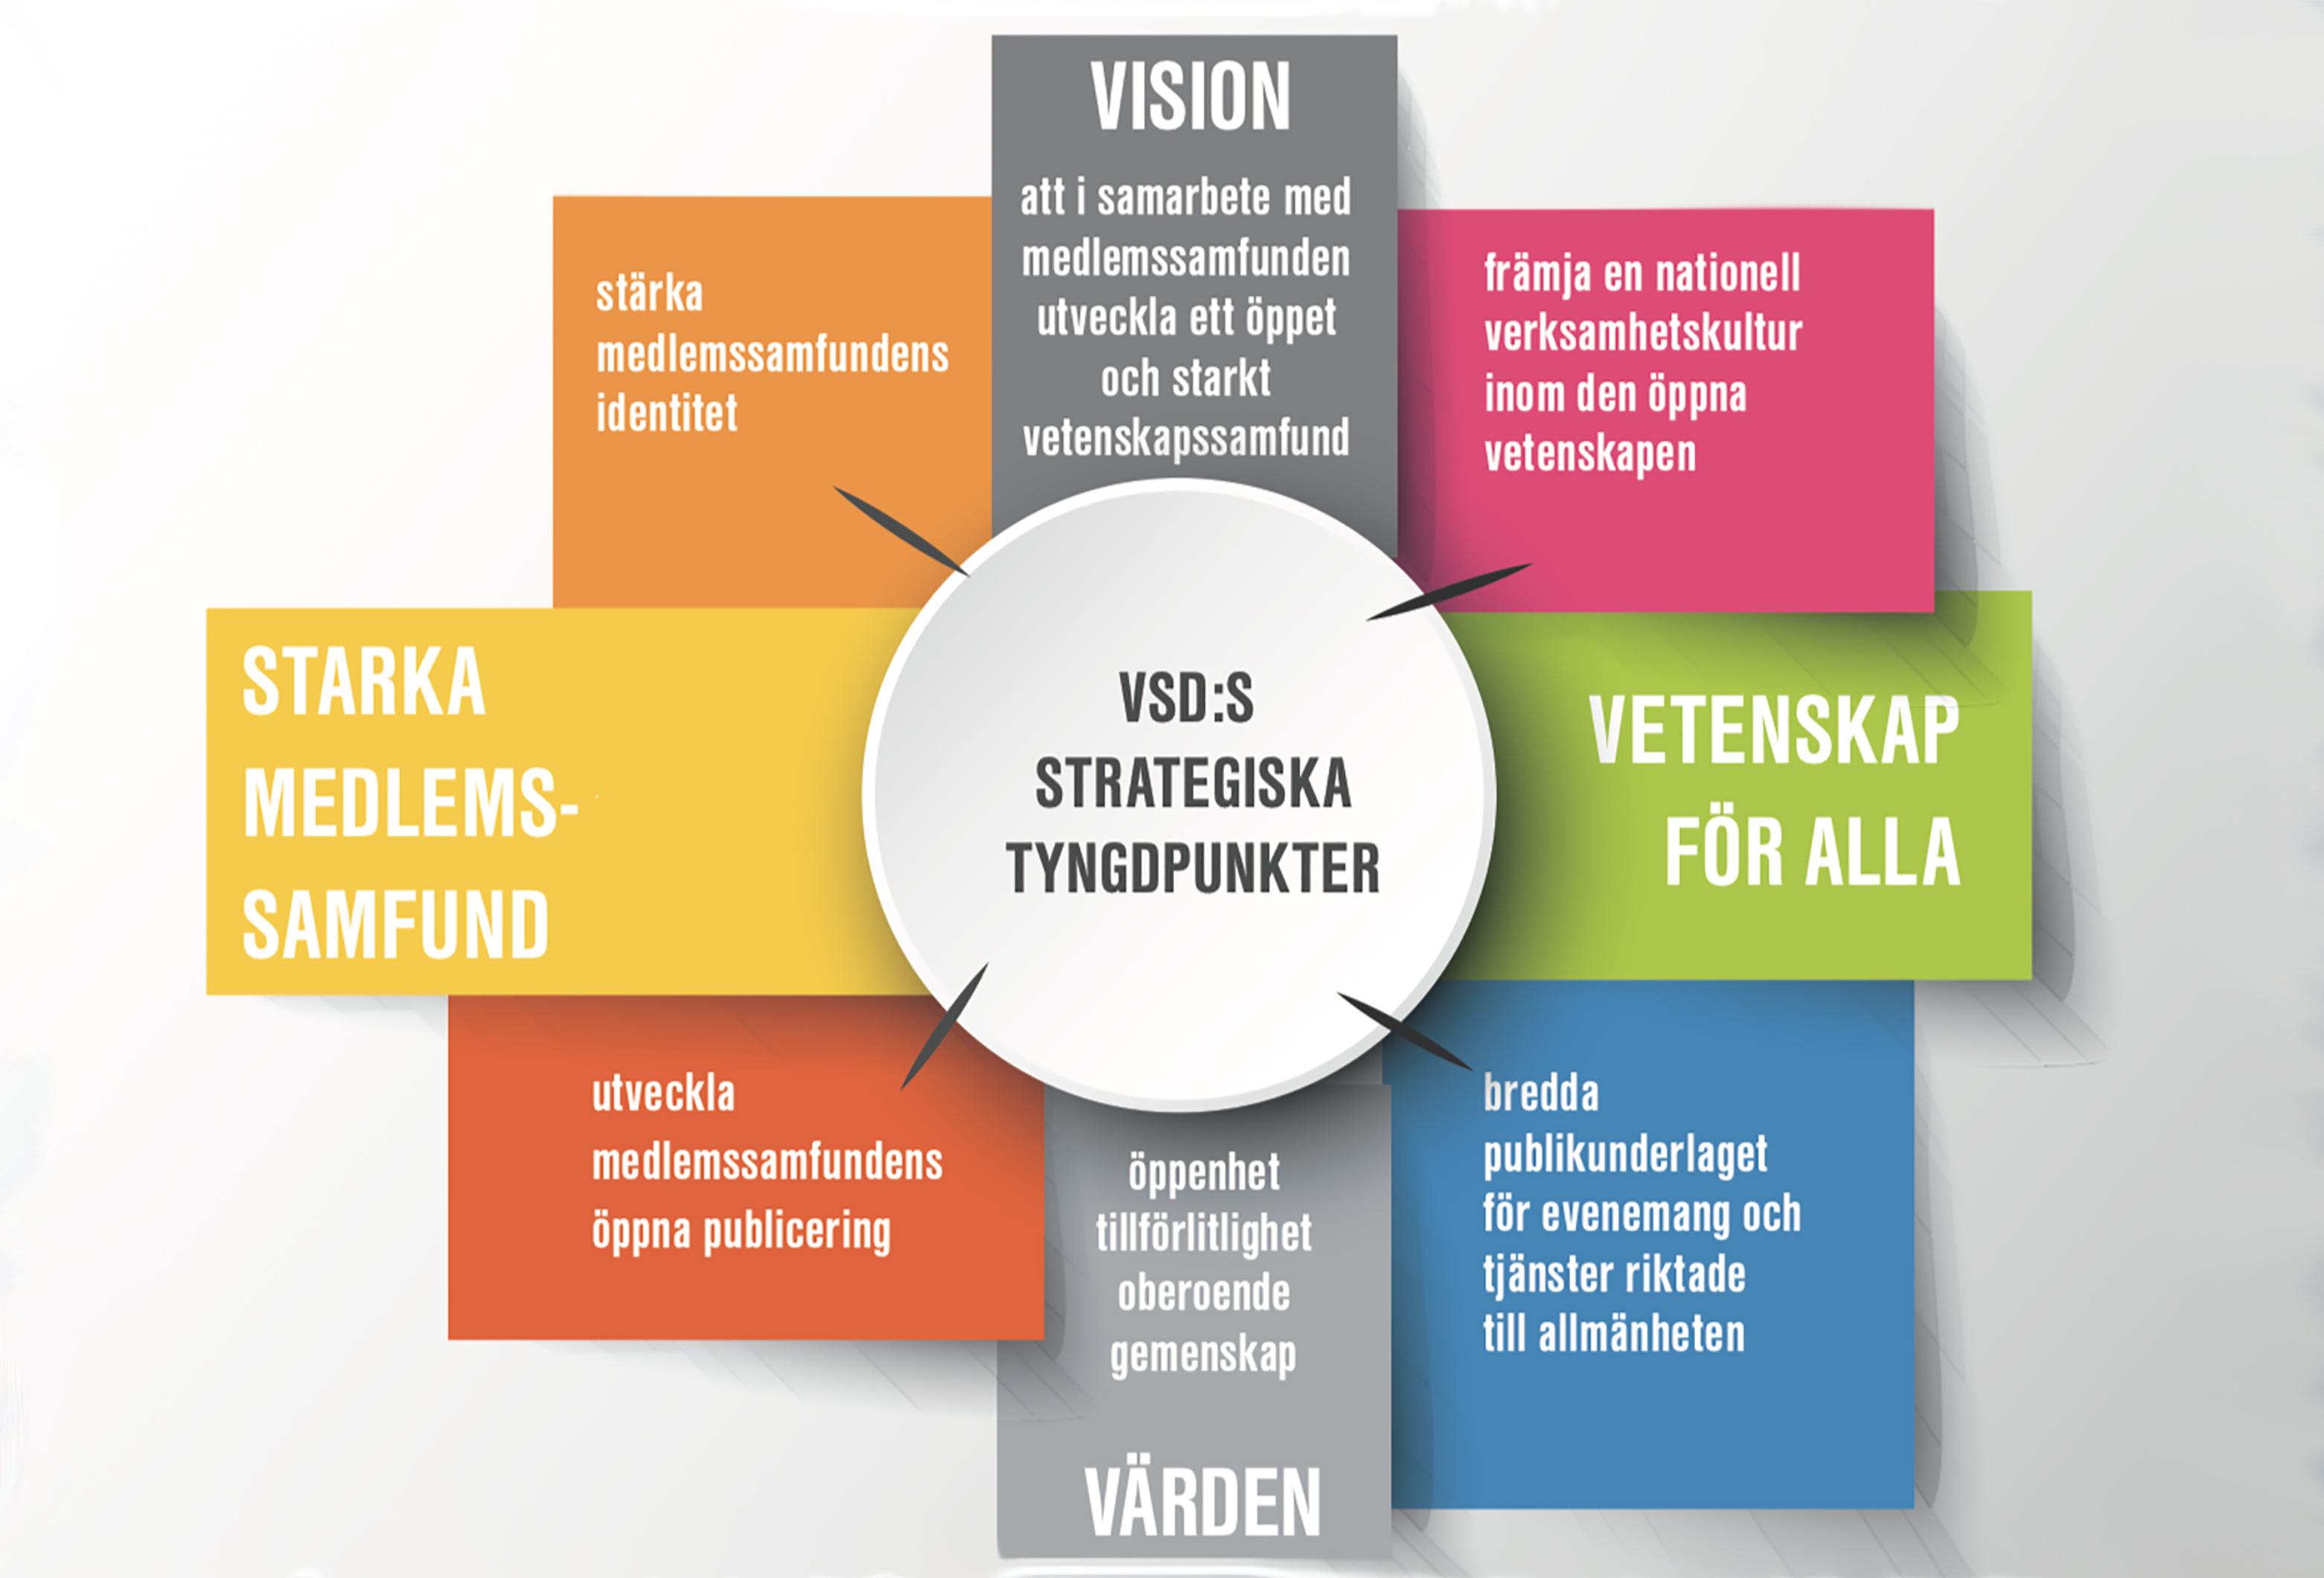 VSD:s strategi i bildform.